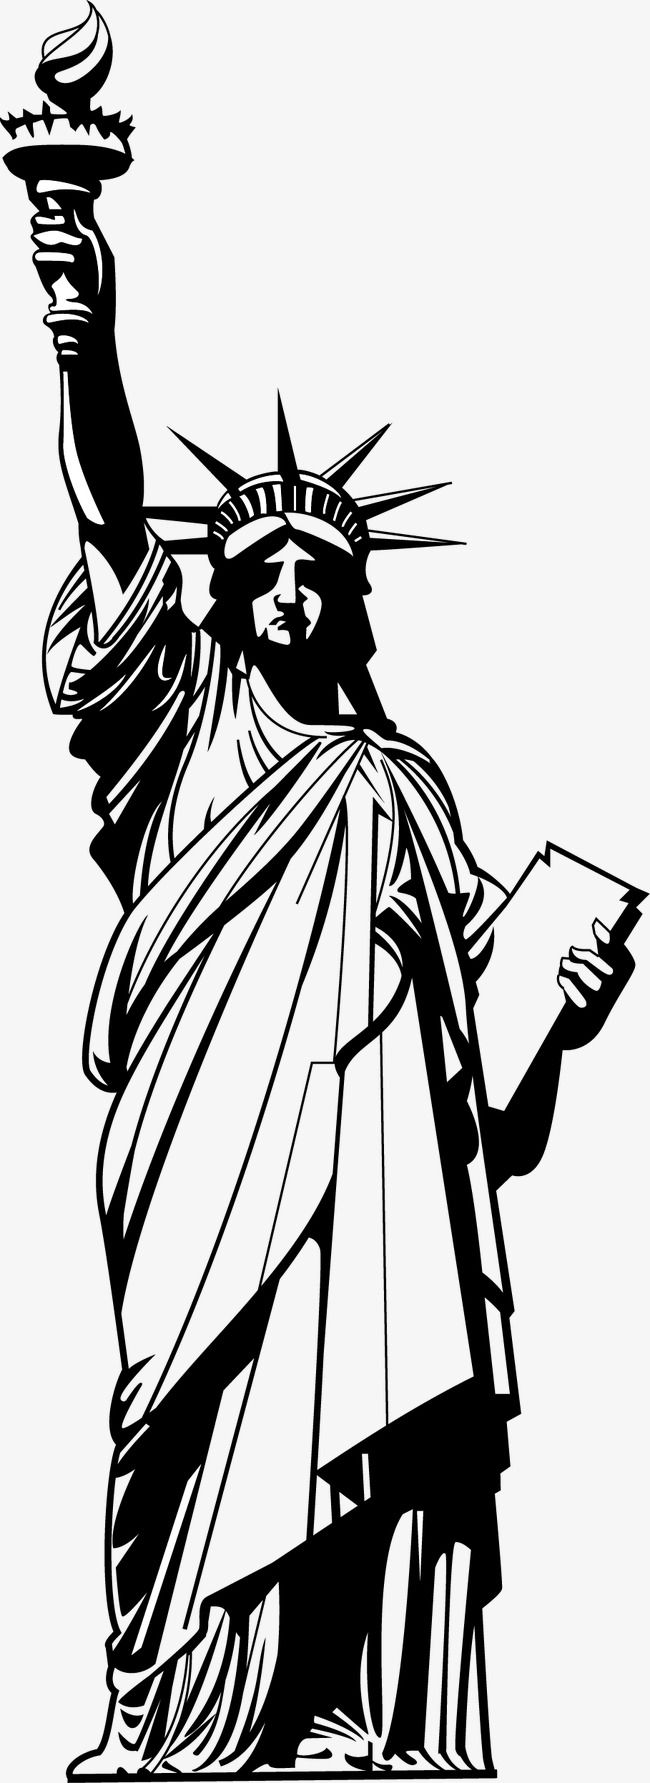 Millones De Imagenes Png Fondos Y Vectores Para Descarga Gratuita Pngtree Tatuaje Estatua De La Libertad Dibujo De Estatua De La Libertad Estatua De La Libertad